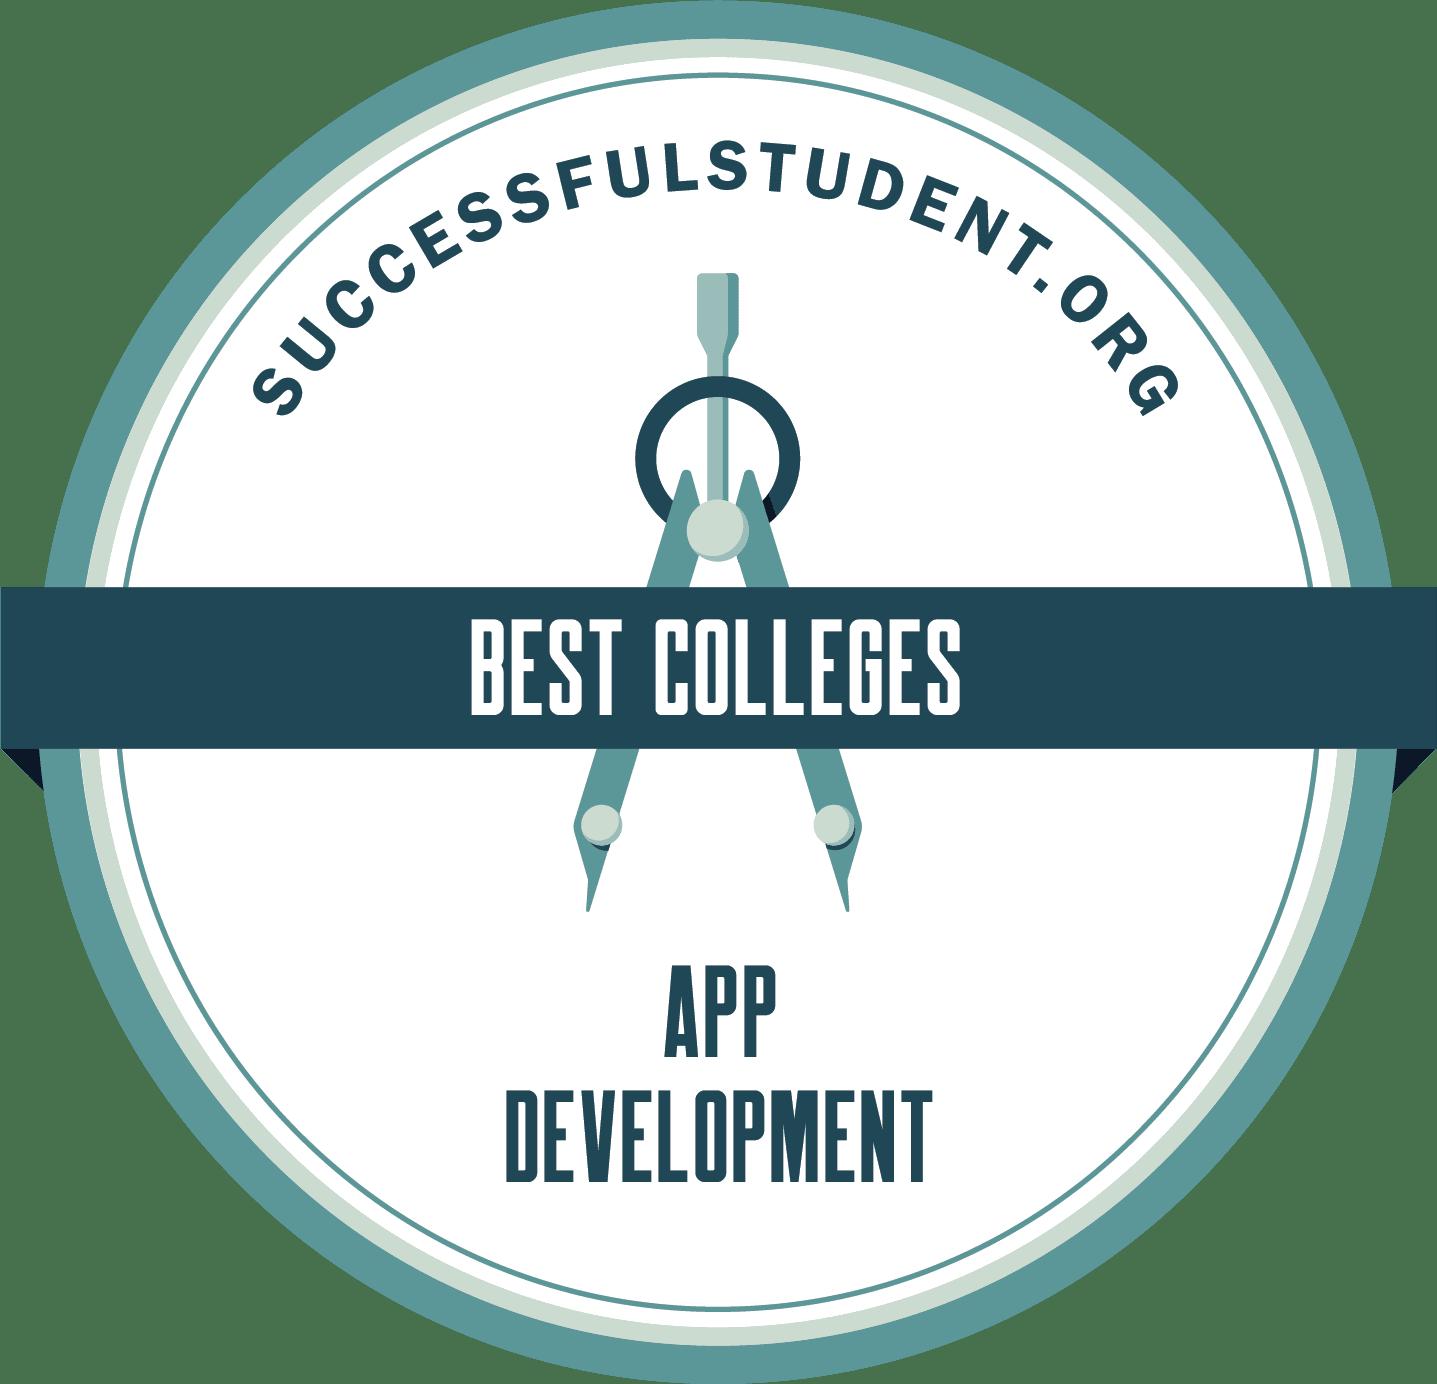 The Best App Development Colleges 2021's Badge